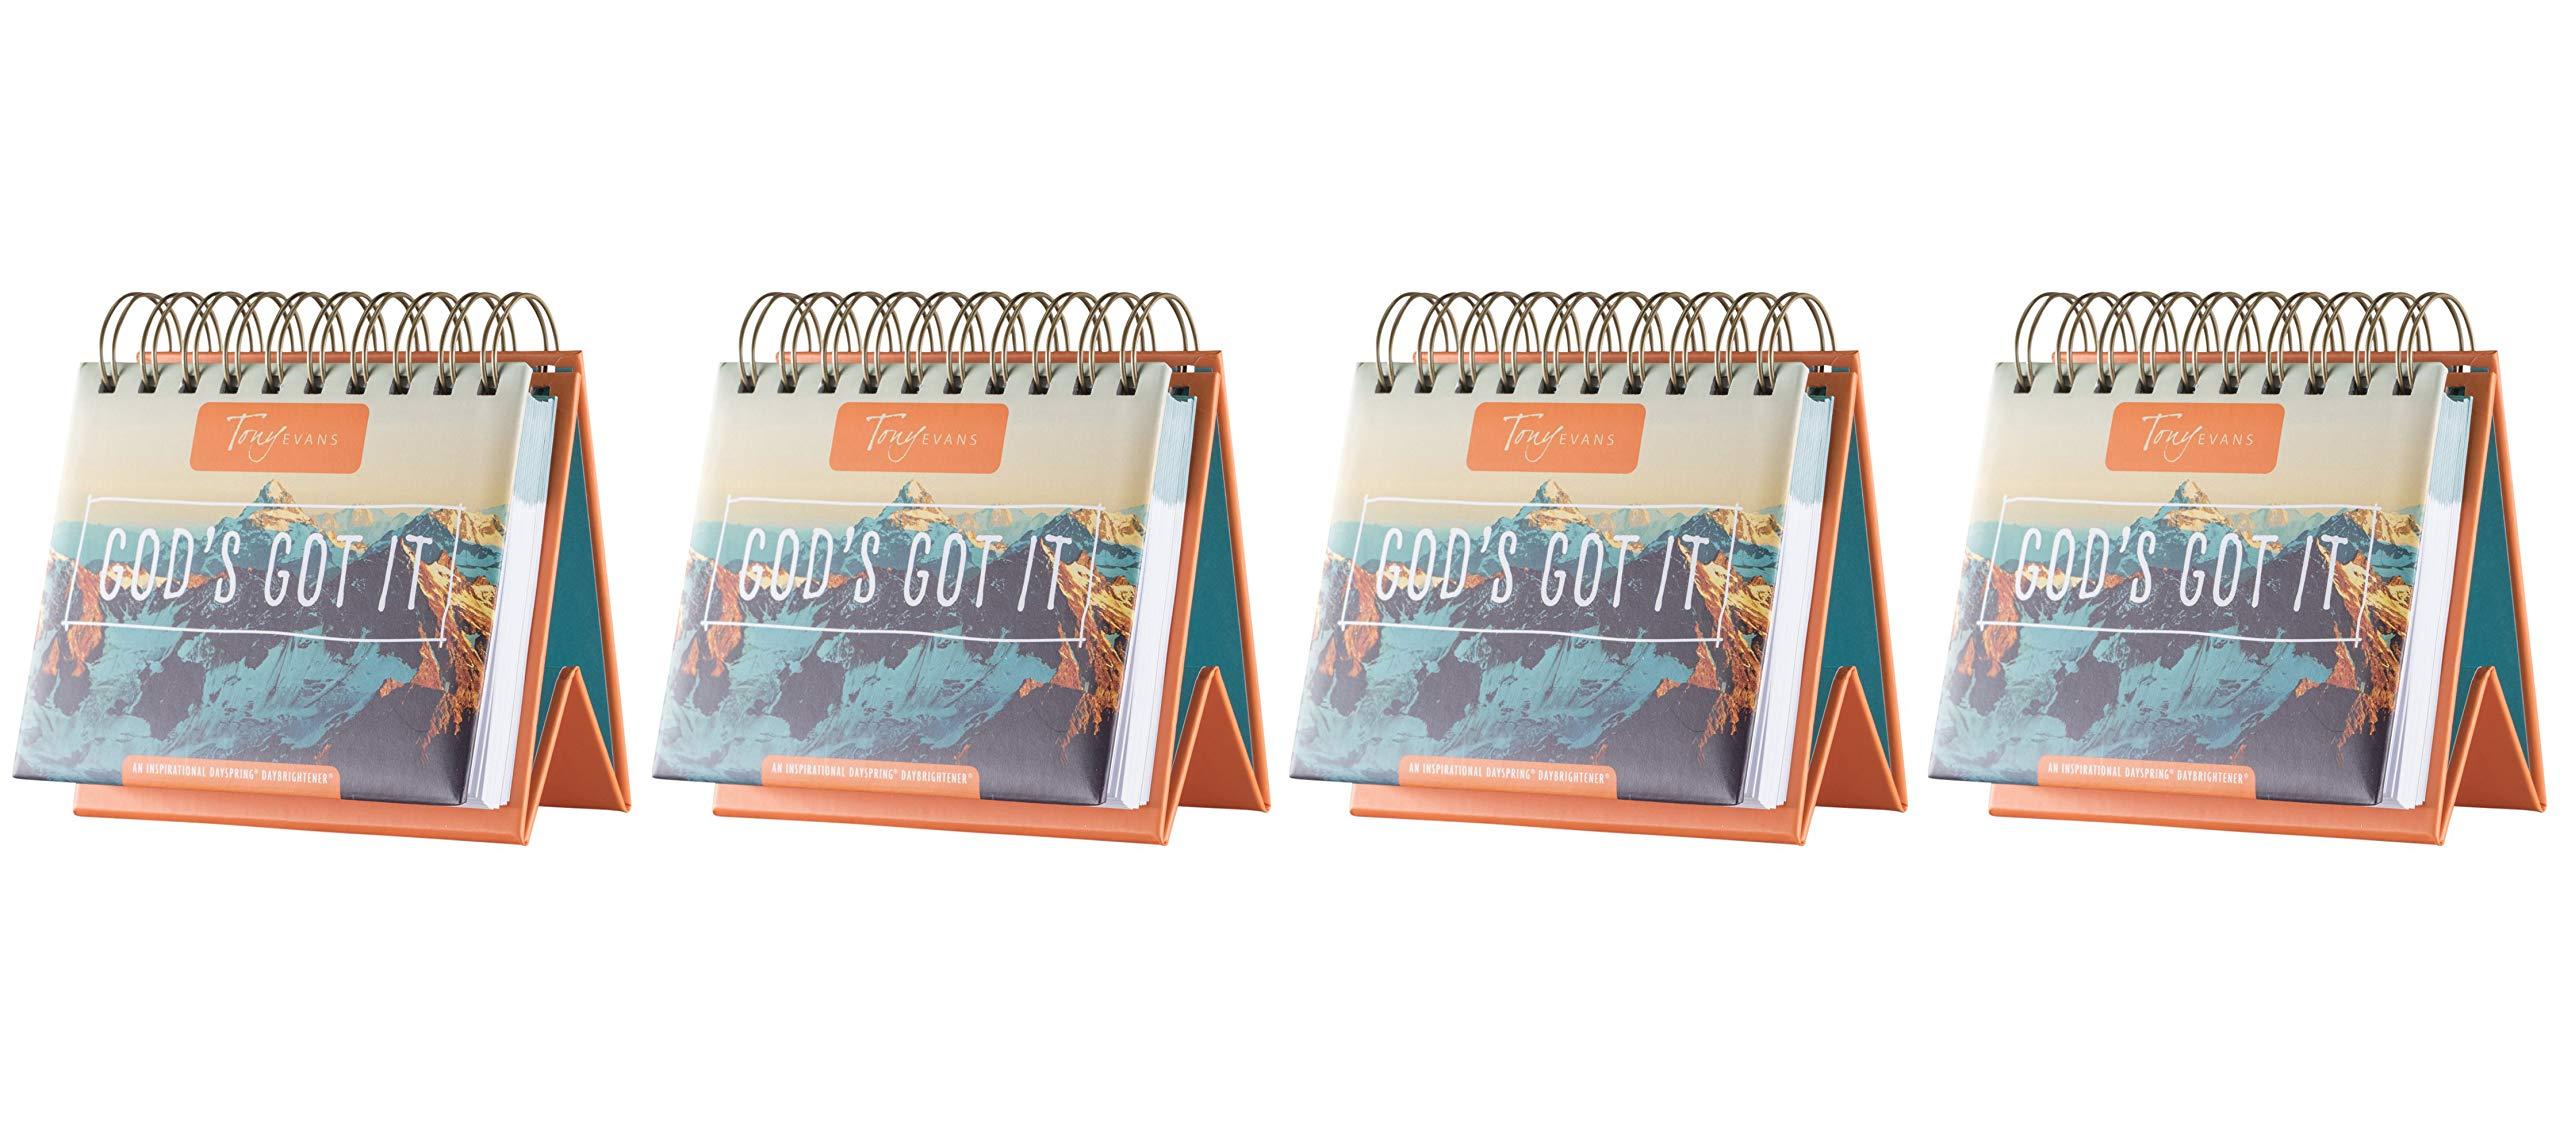 Flip Calendar - Tony Evan's God's Got It (Fоur Paсk) by Dayspring